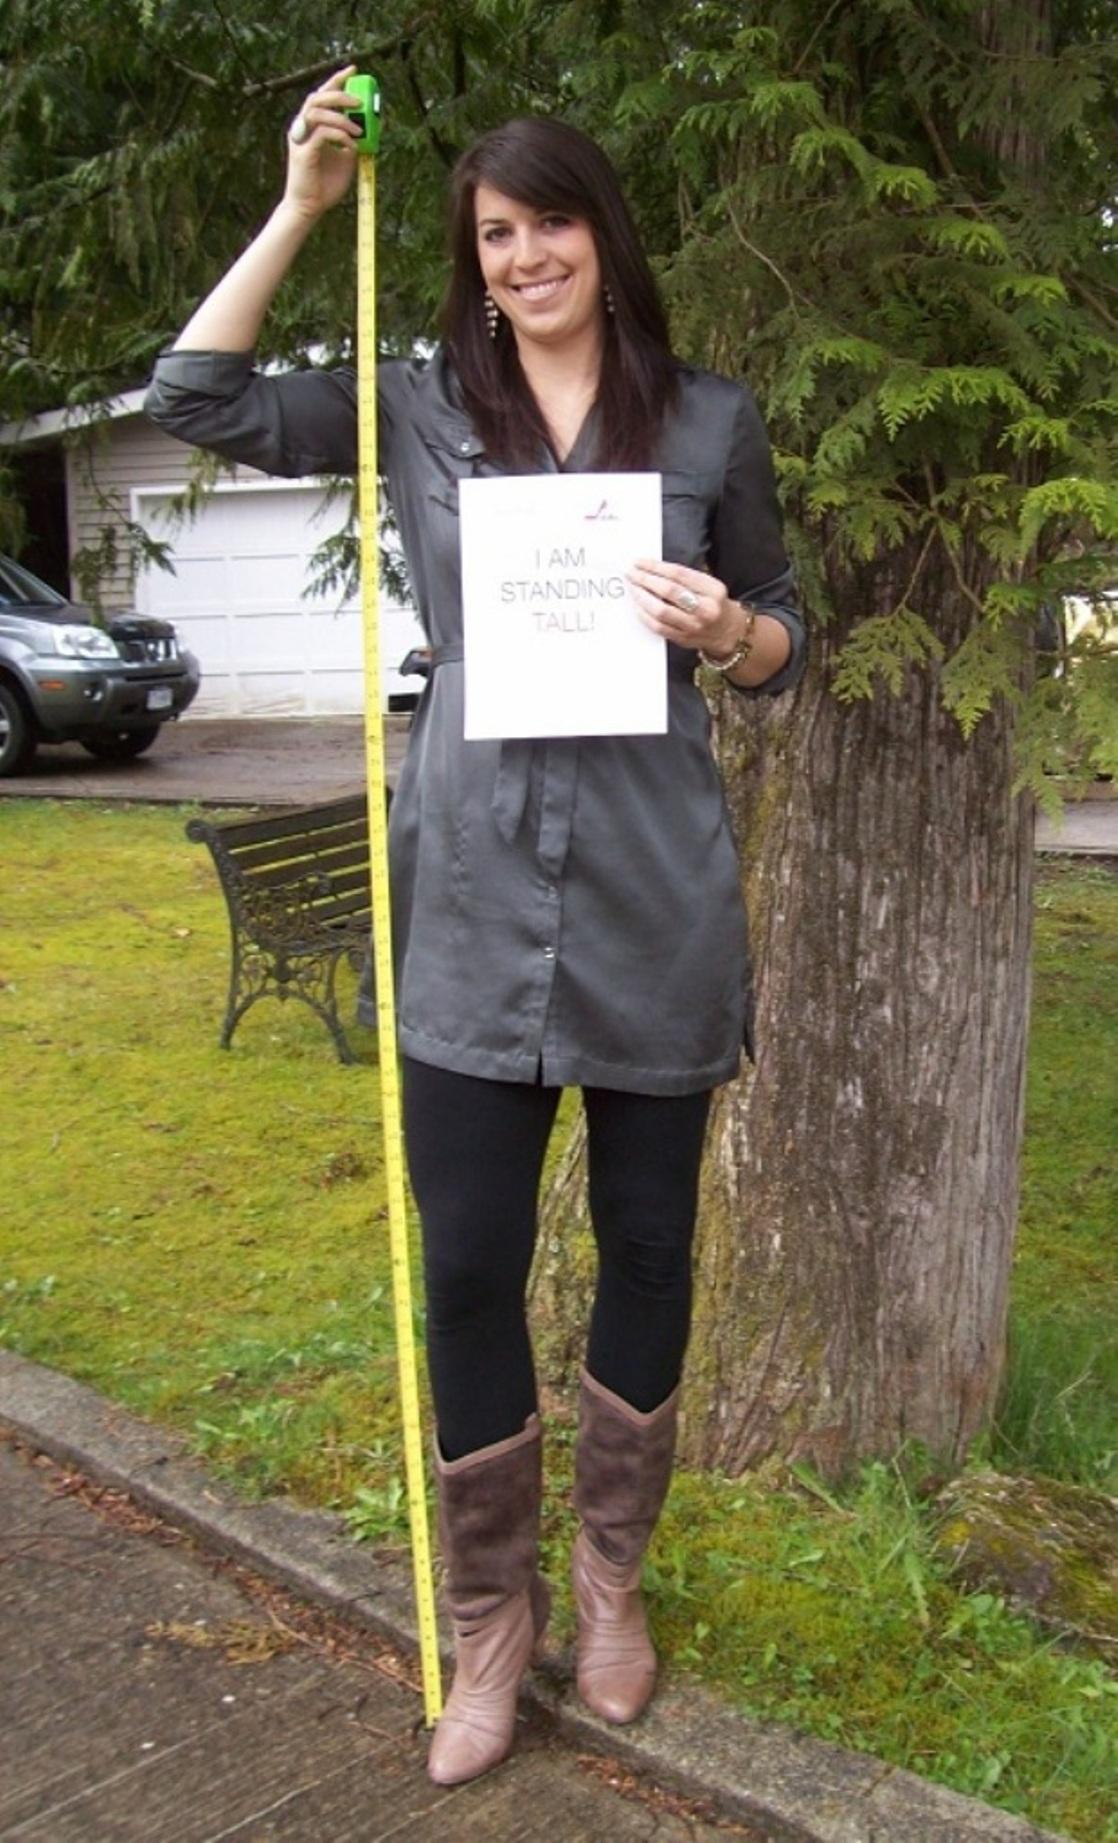 i am standing tall ii 6ft3 girl 191cm by zaratustraelsabio on deviantart. Black Bedroom Furniture Sets. Home Design Ideas